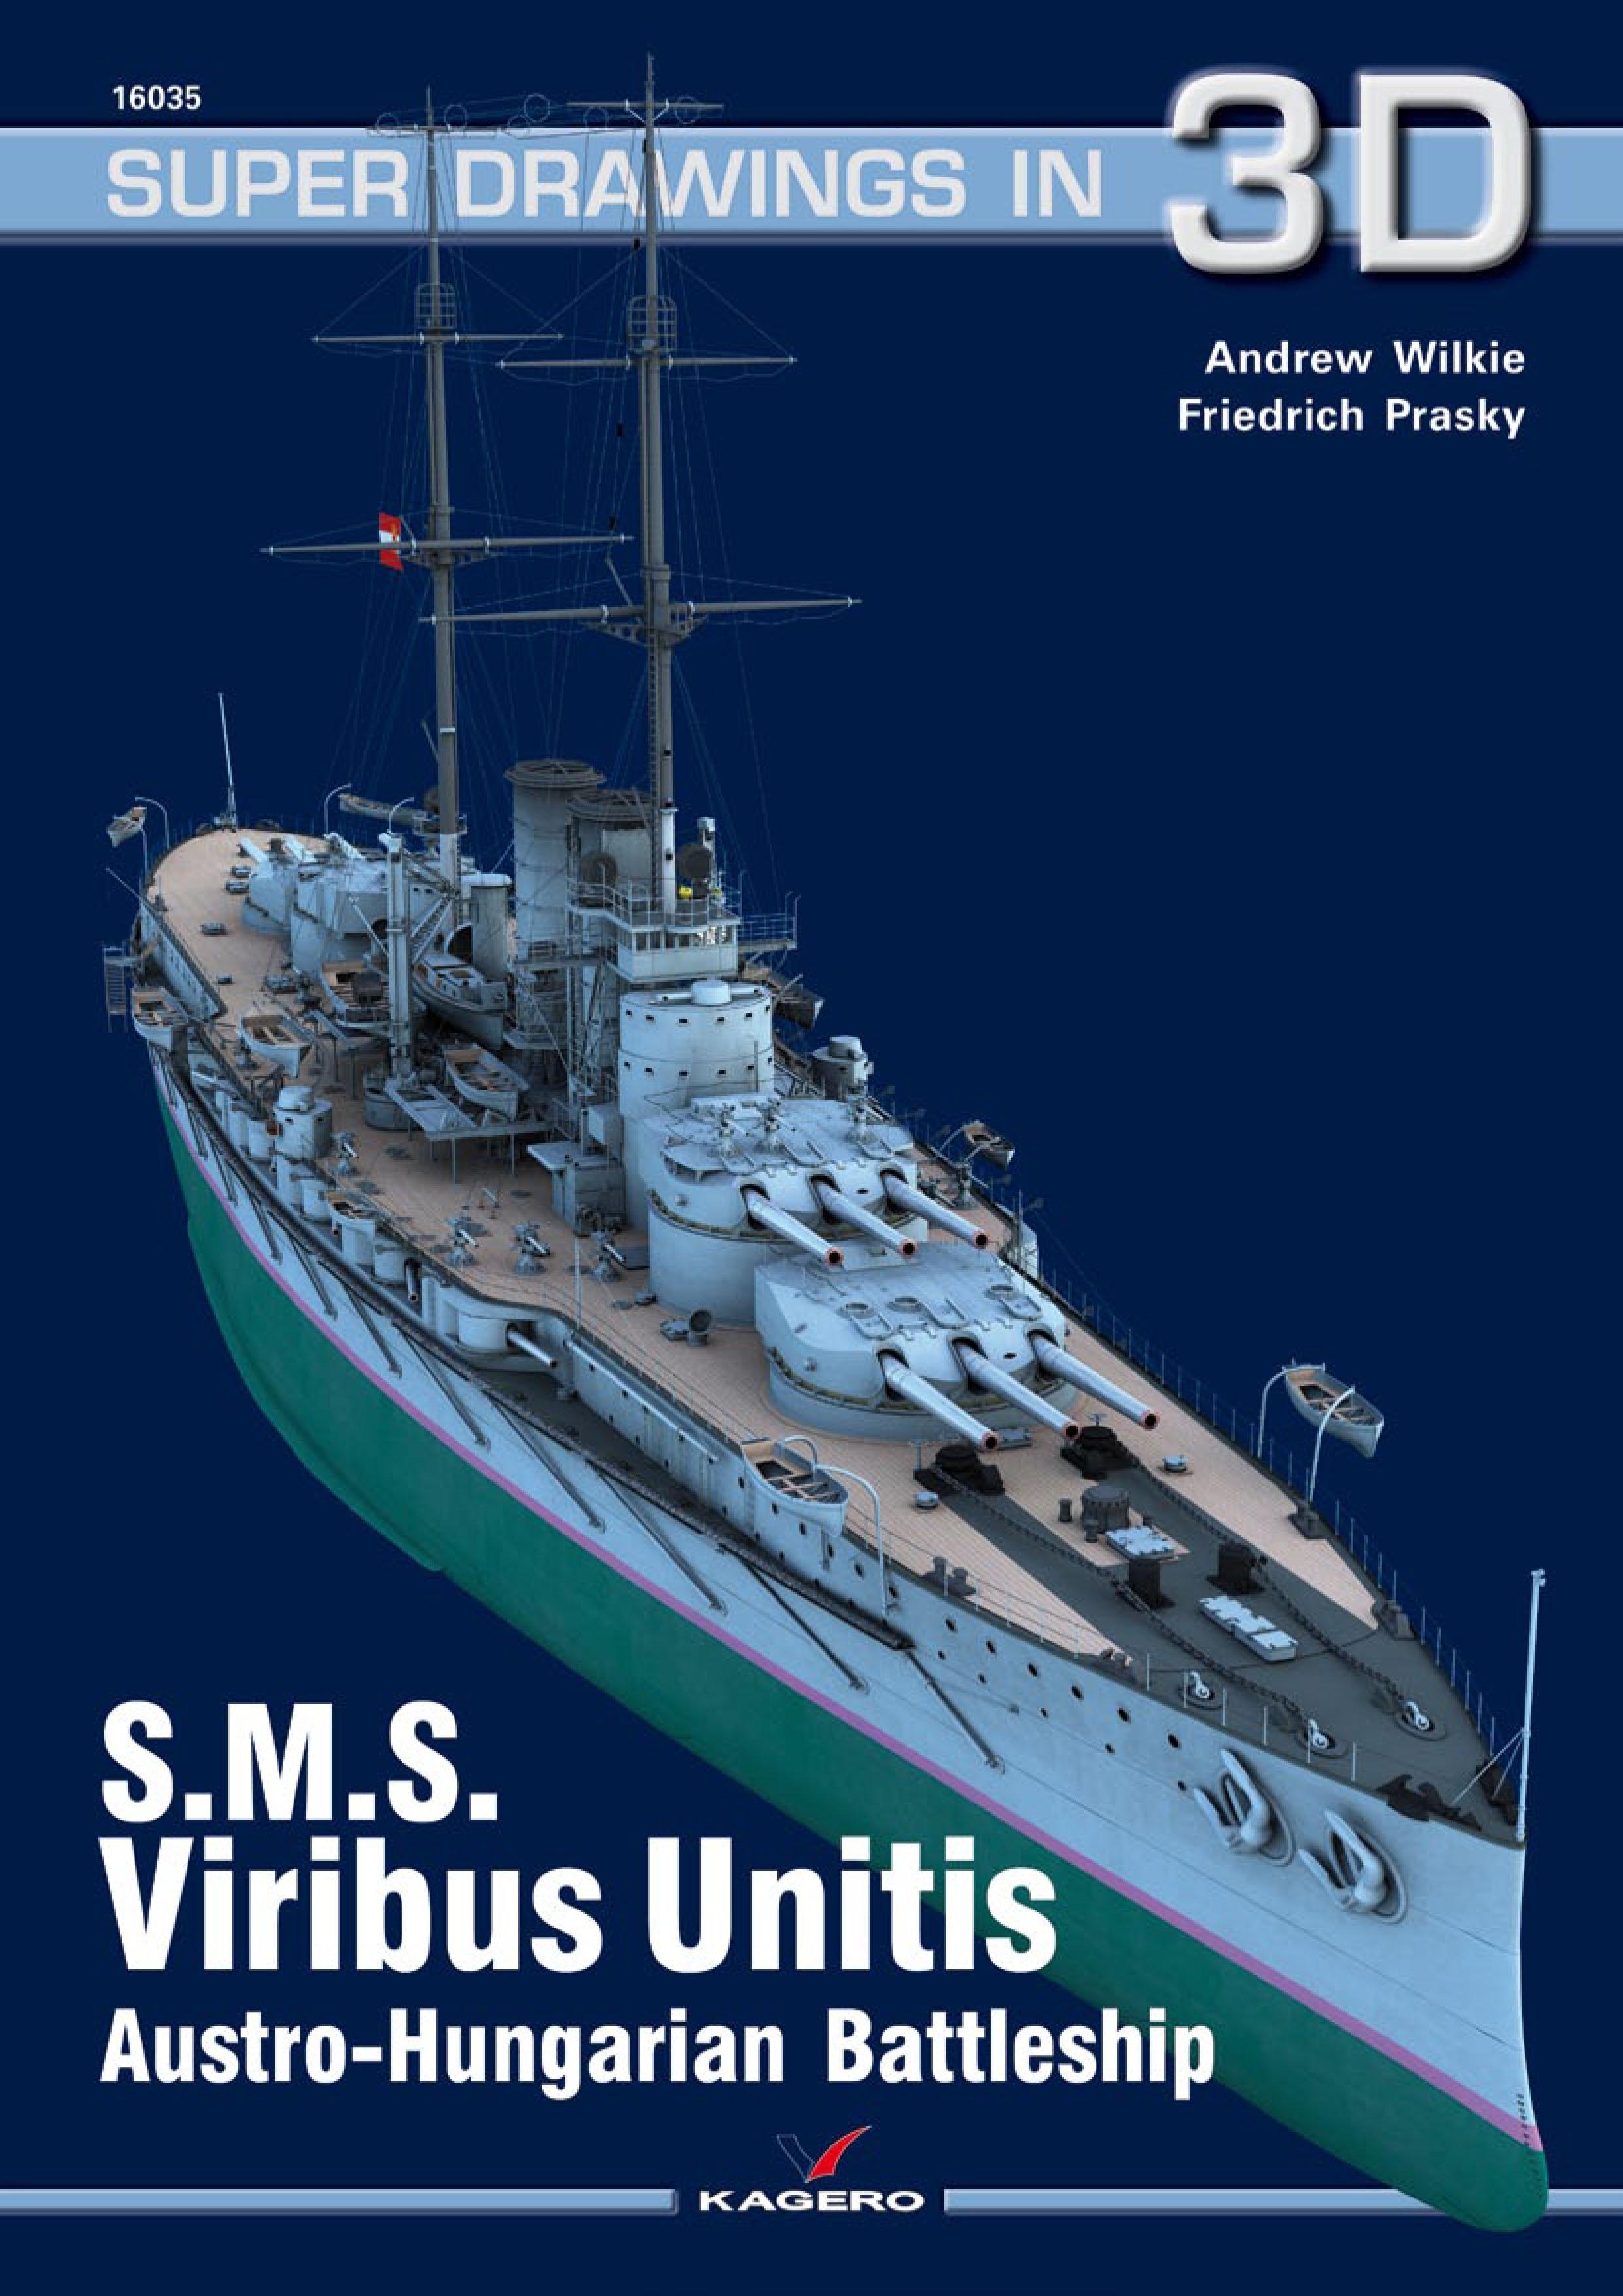 https://0901.nccdn.net/4_2/000/000/07a/dbb/Kagero-Viribus-Unitis-Front-Cover-2480x3508.jpg